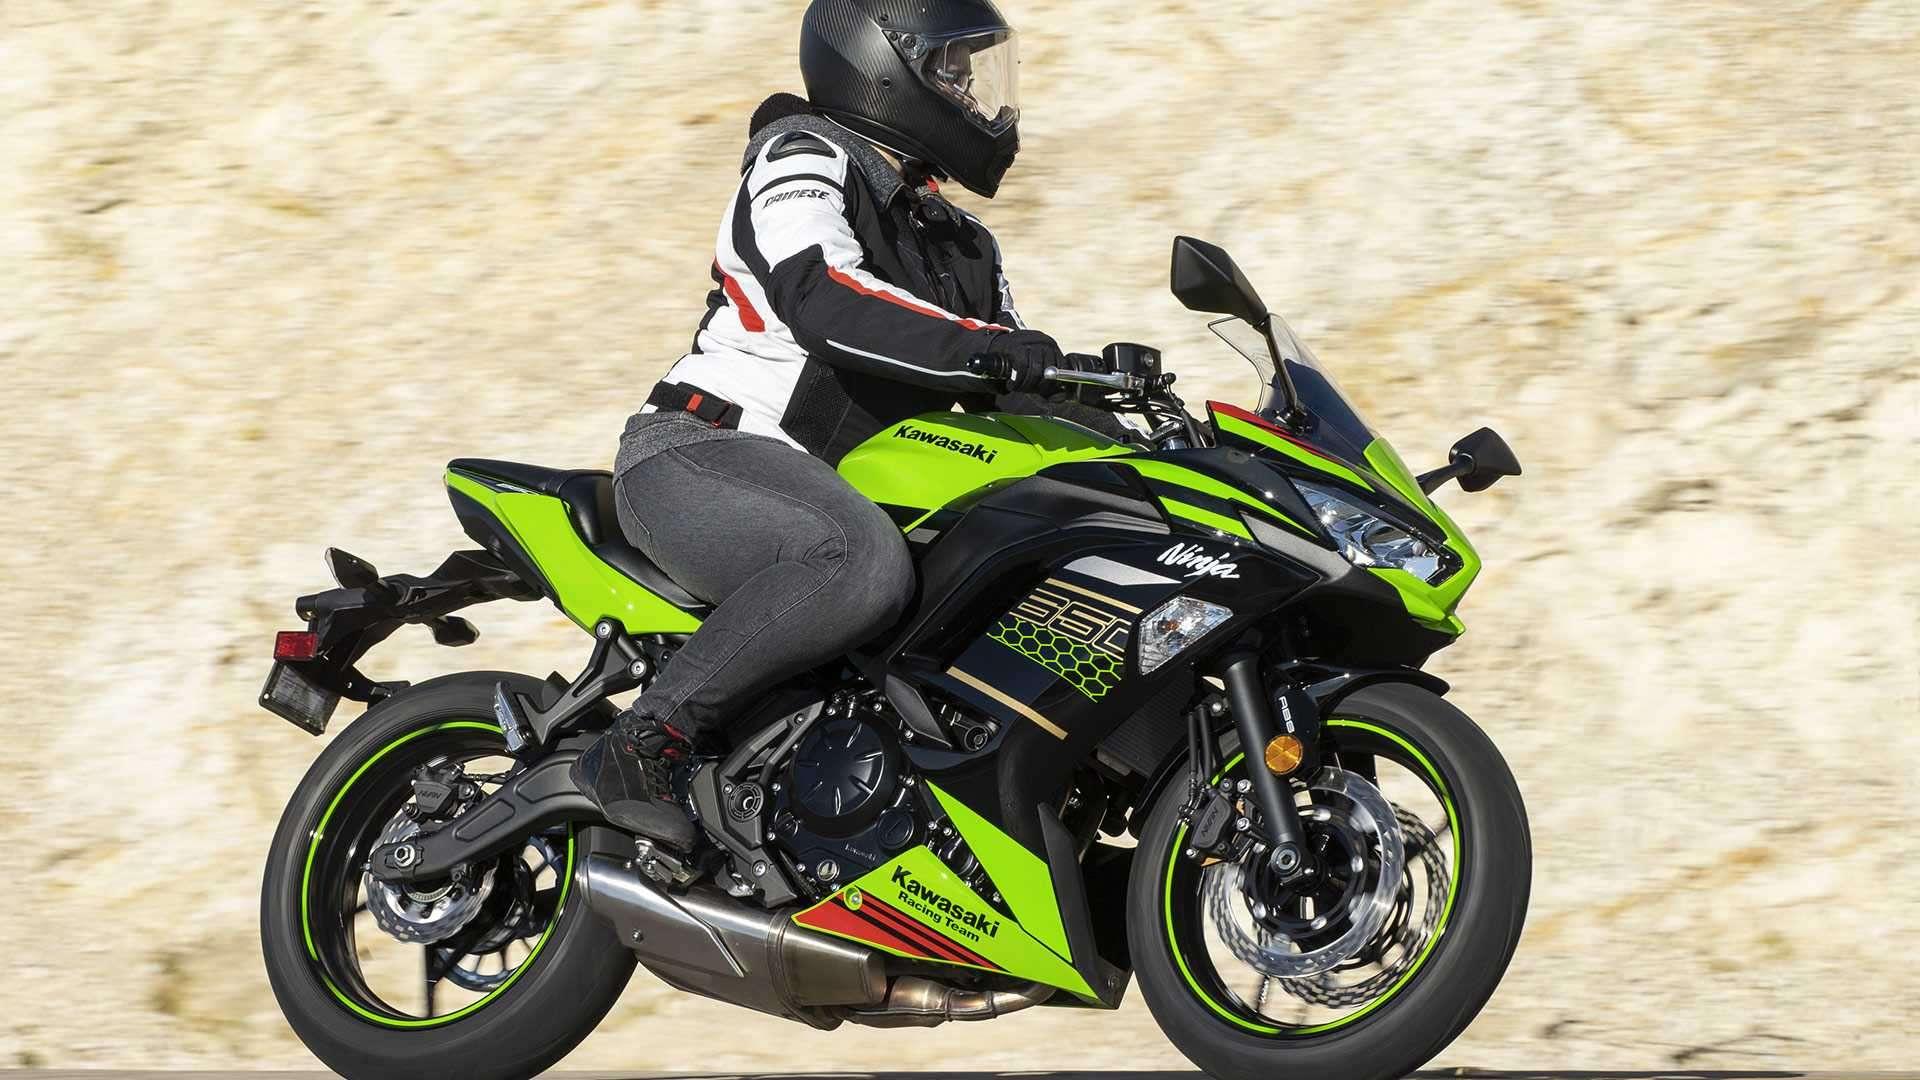 Test Ride Kawasaki Ninja 650 ABS KRT Edition 2020